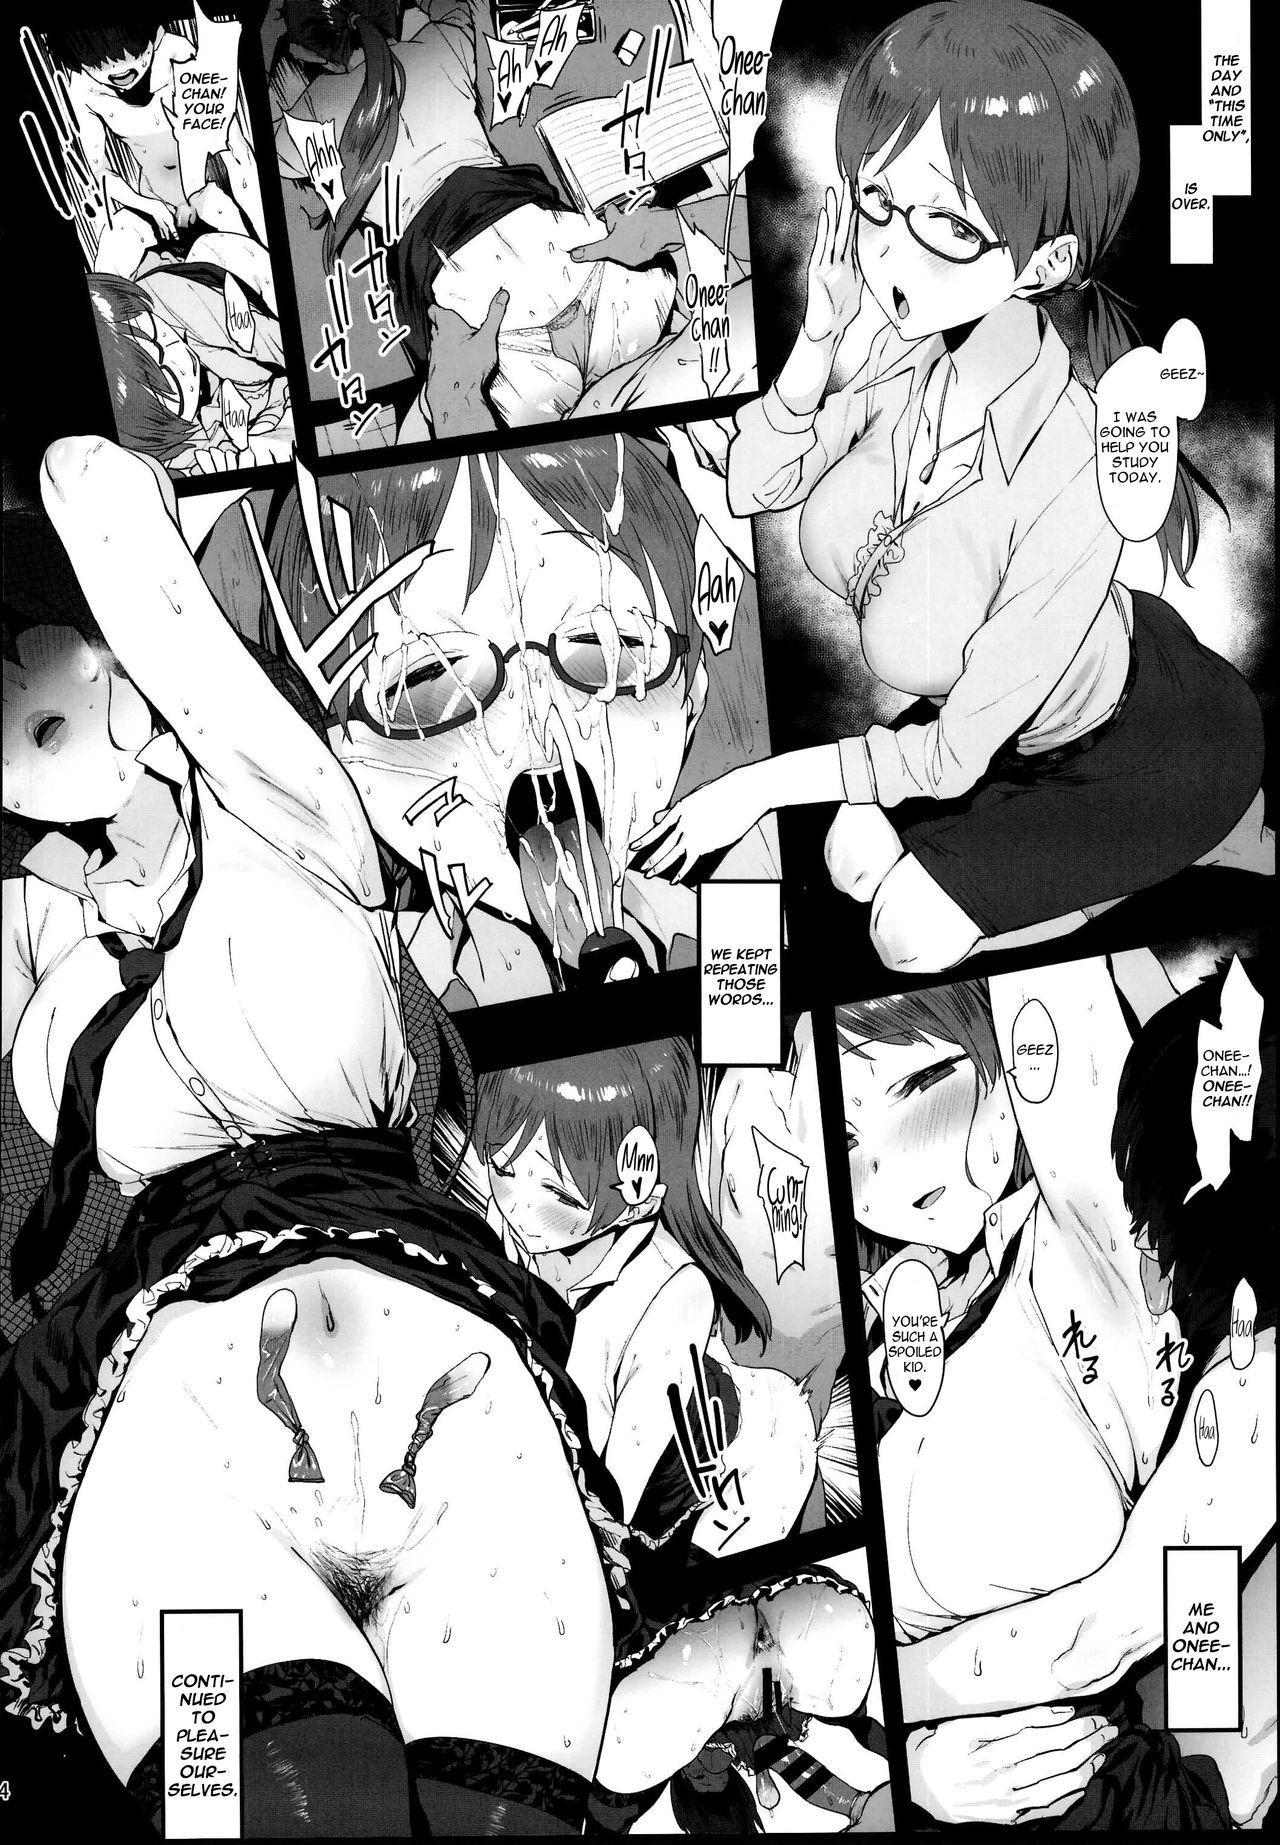 Nitta no Onee-chan 12